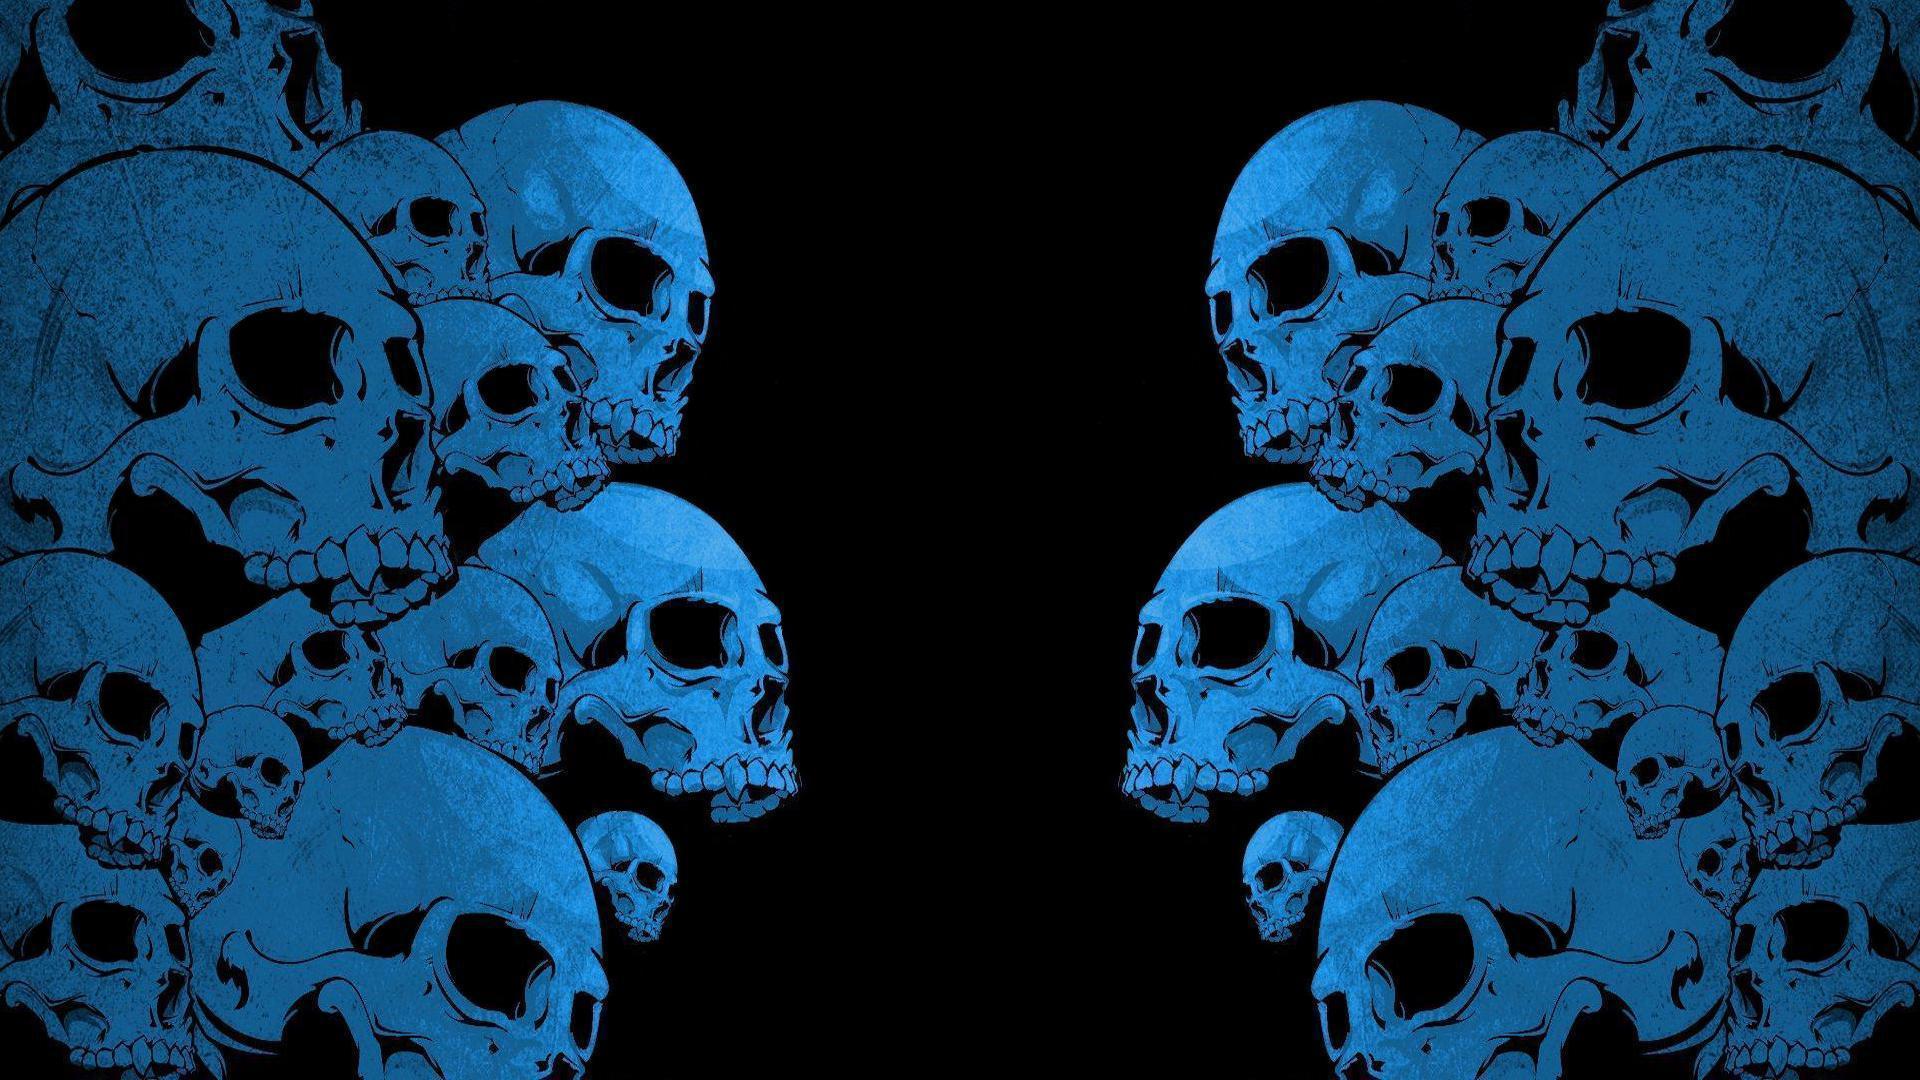 HD Skull Wallpapers 1920x1080